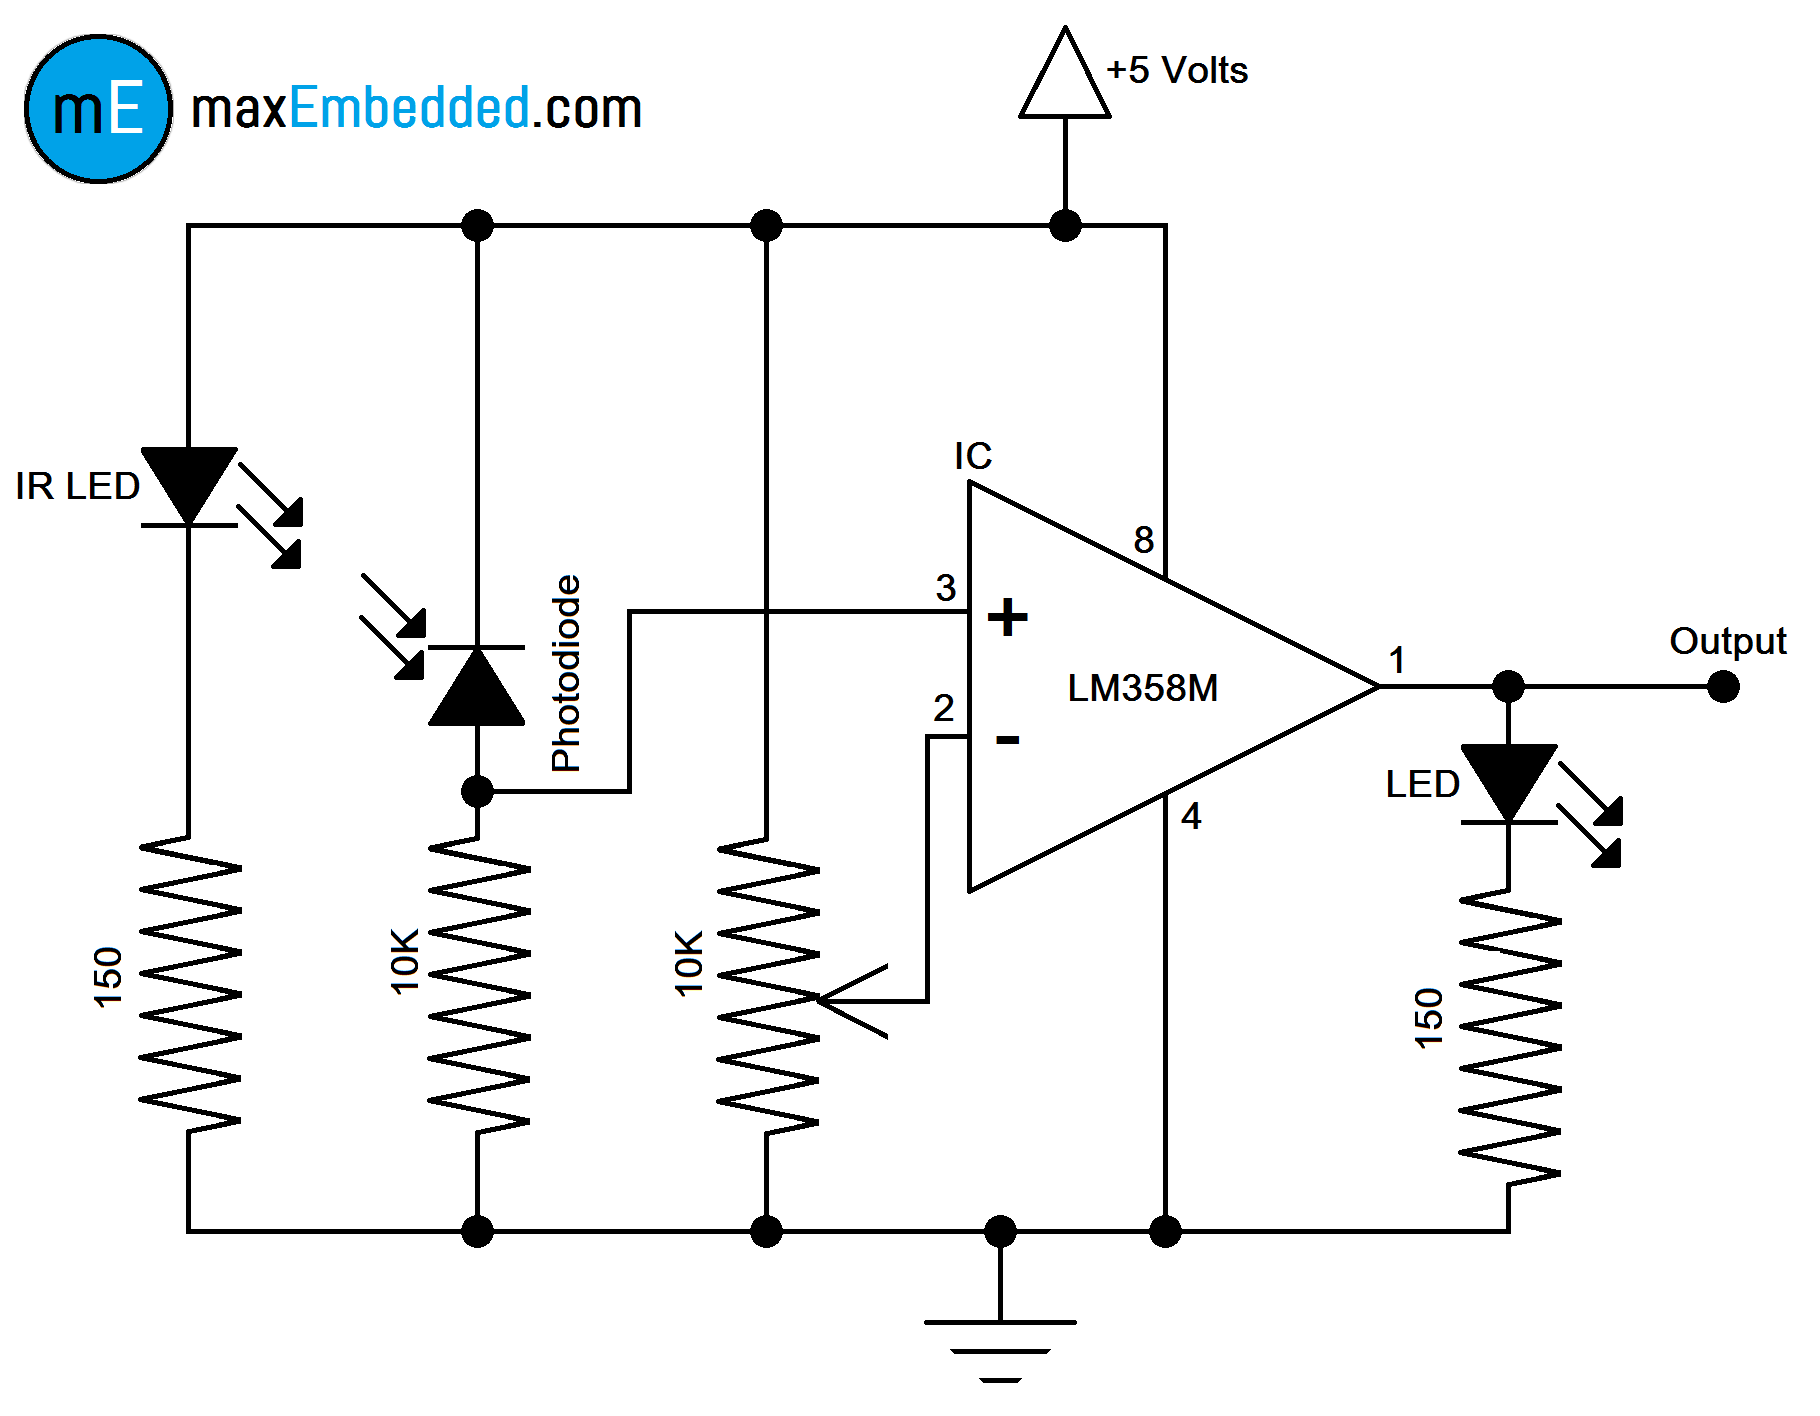 how to build an ir sensor maxembedded rh maxembedded com Photo Sensor Wiring Diagram Photo Sensor Wiring Diagram